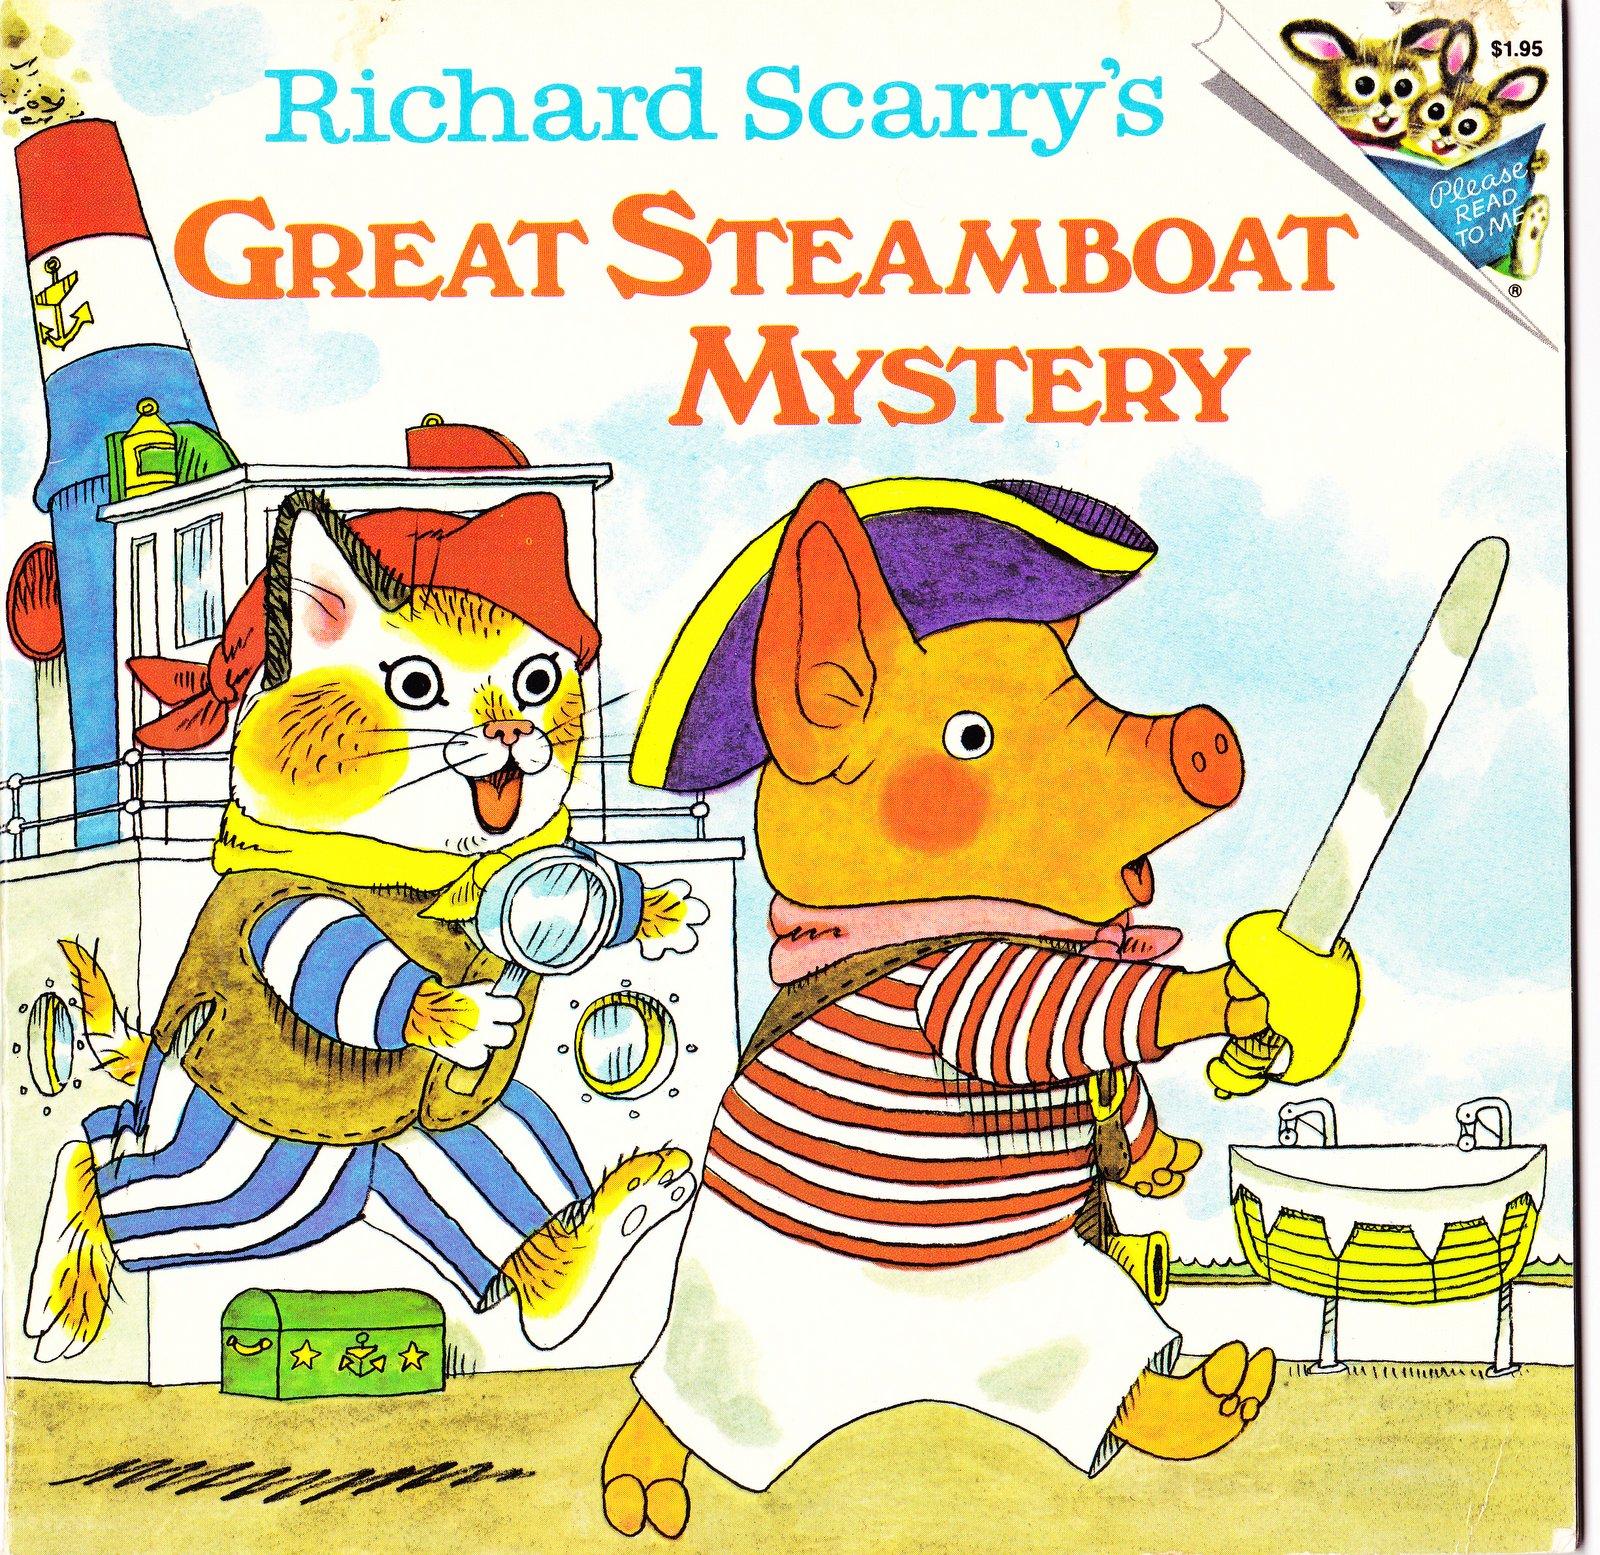 richard scarry